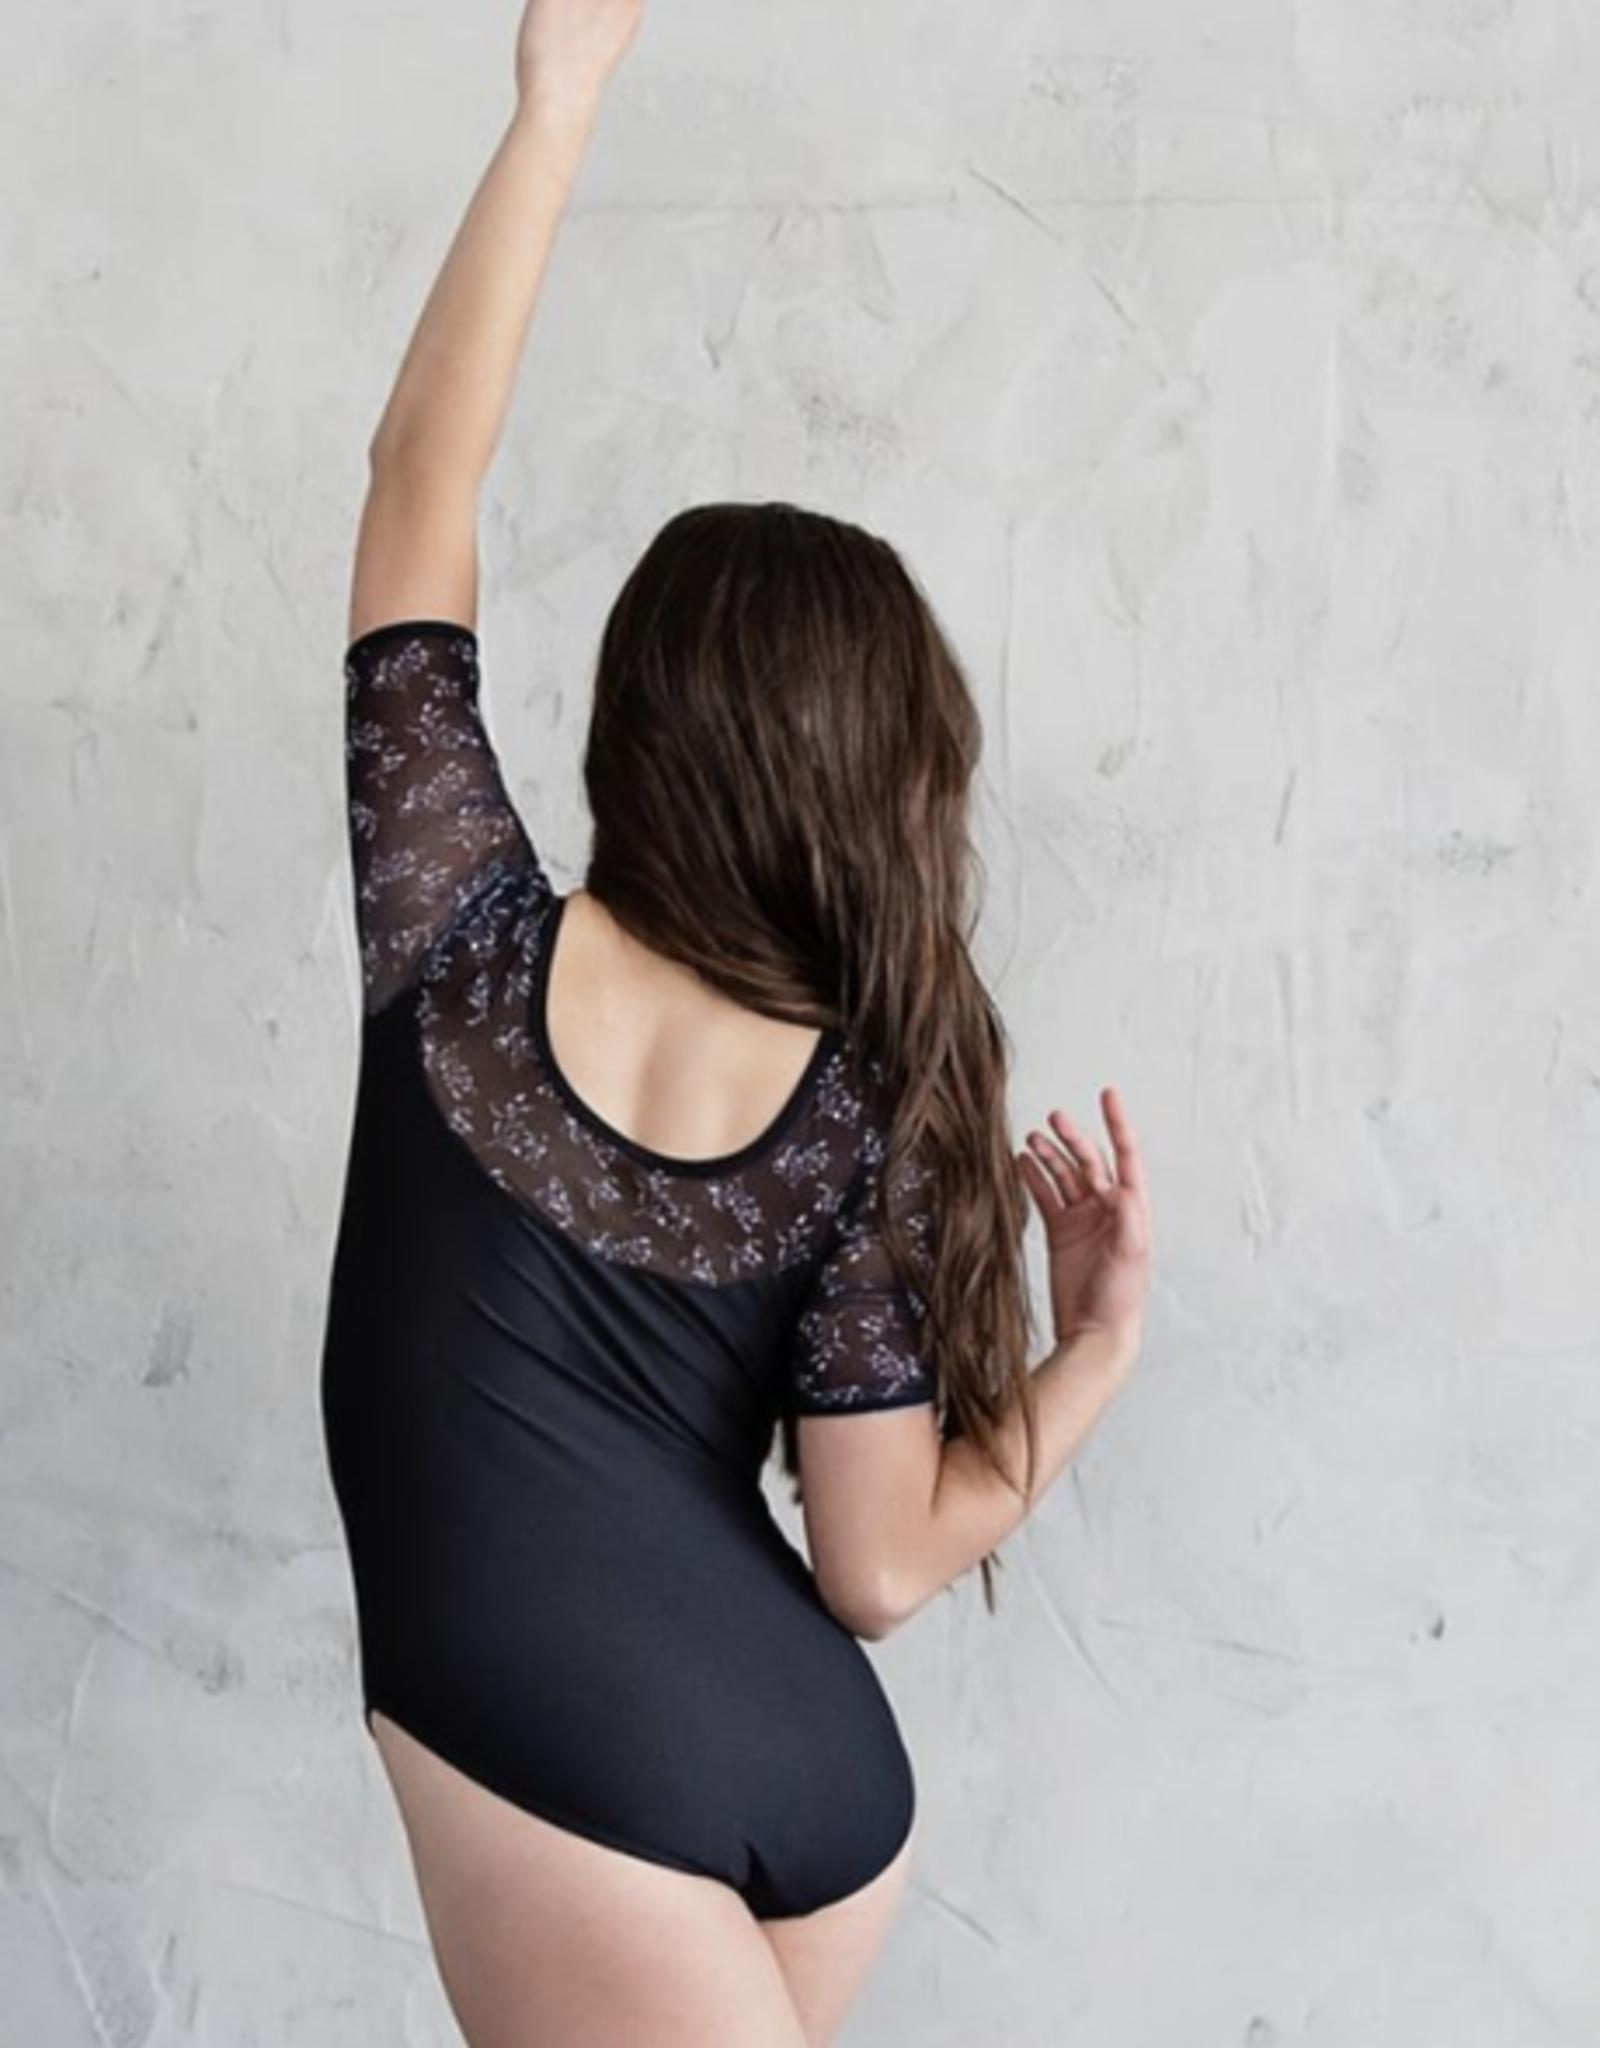 Chic Ballet The Octavia Leotard Black Floral (CHIC115-BFL)